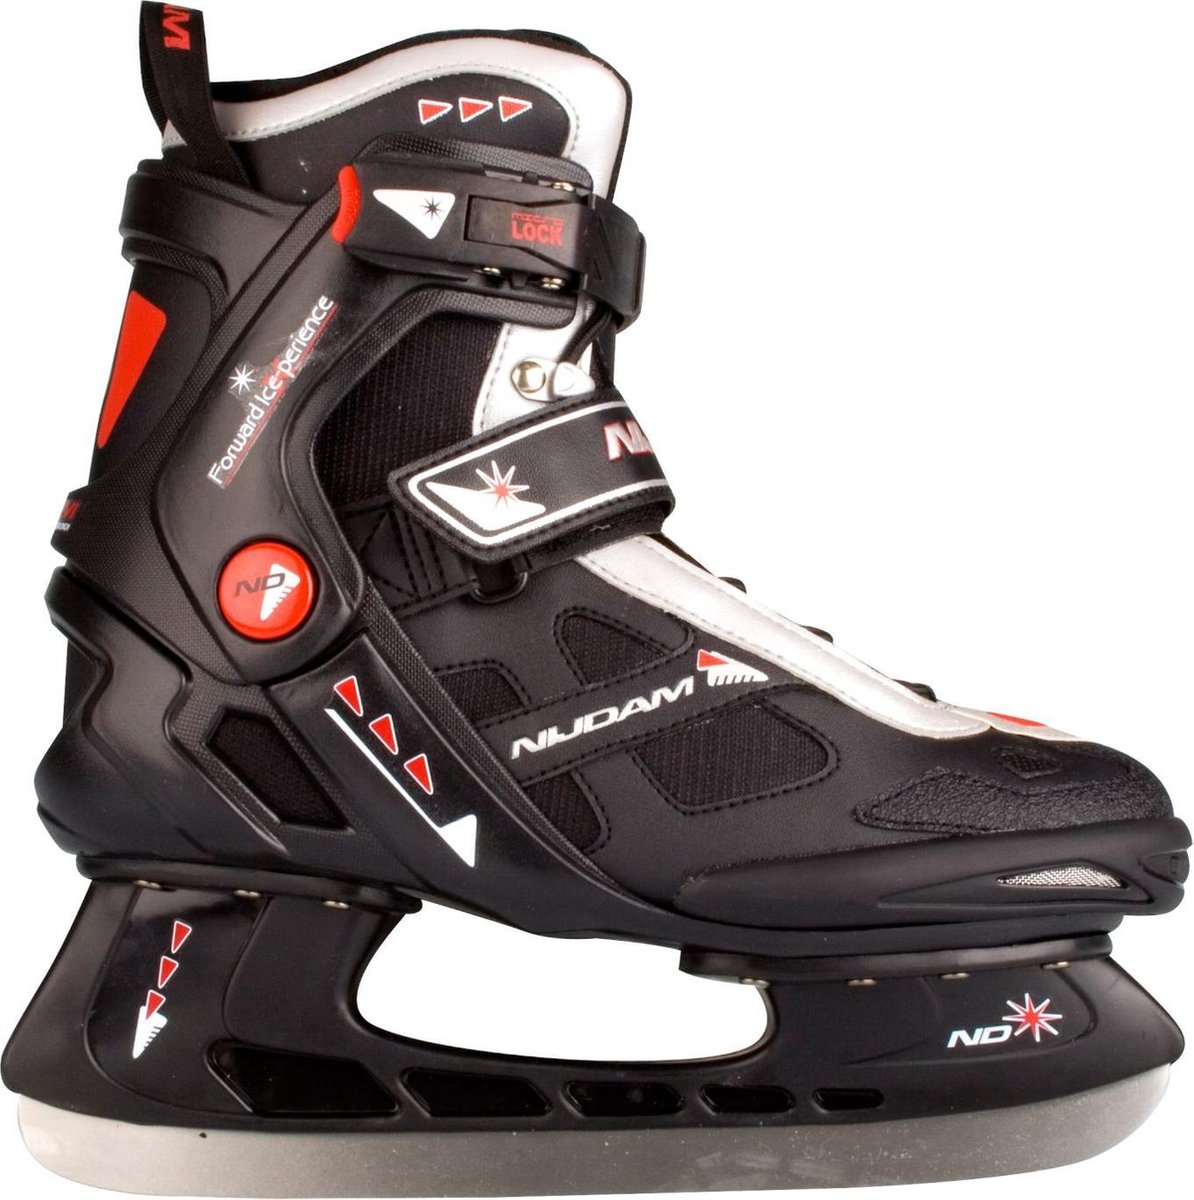 Nijdam IJshockeyschaats - Semi-Softboot - Zwart/Zilver/Rood - 44